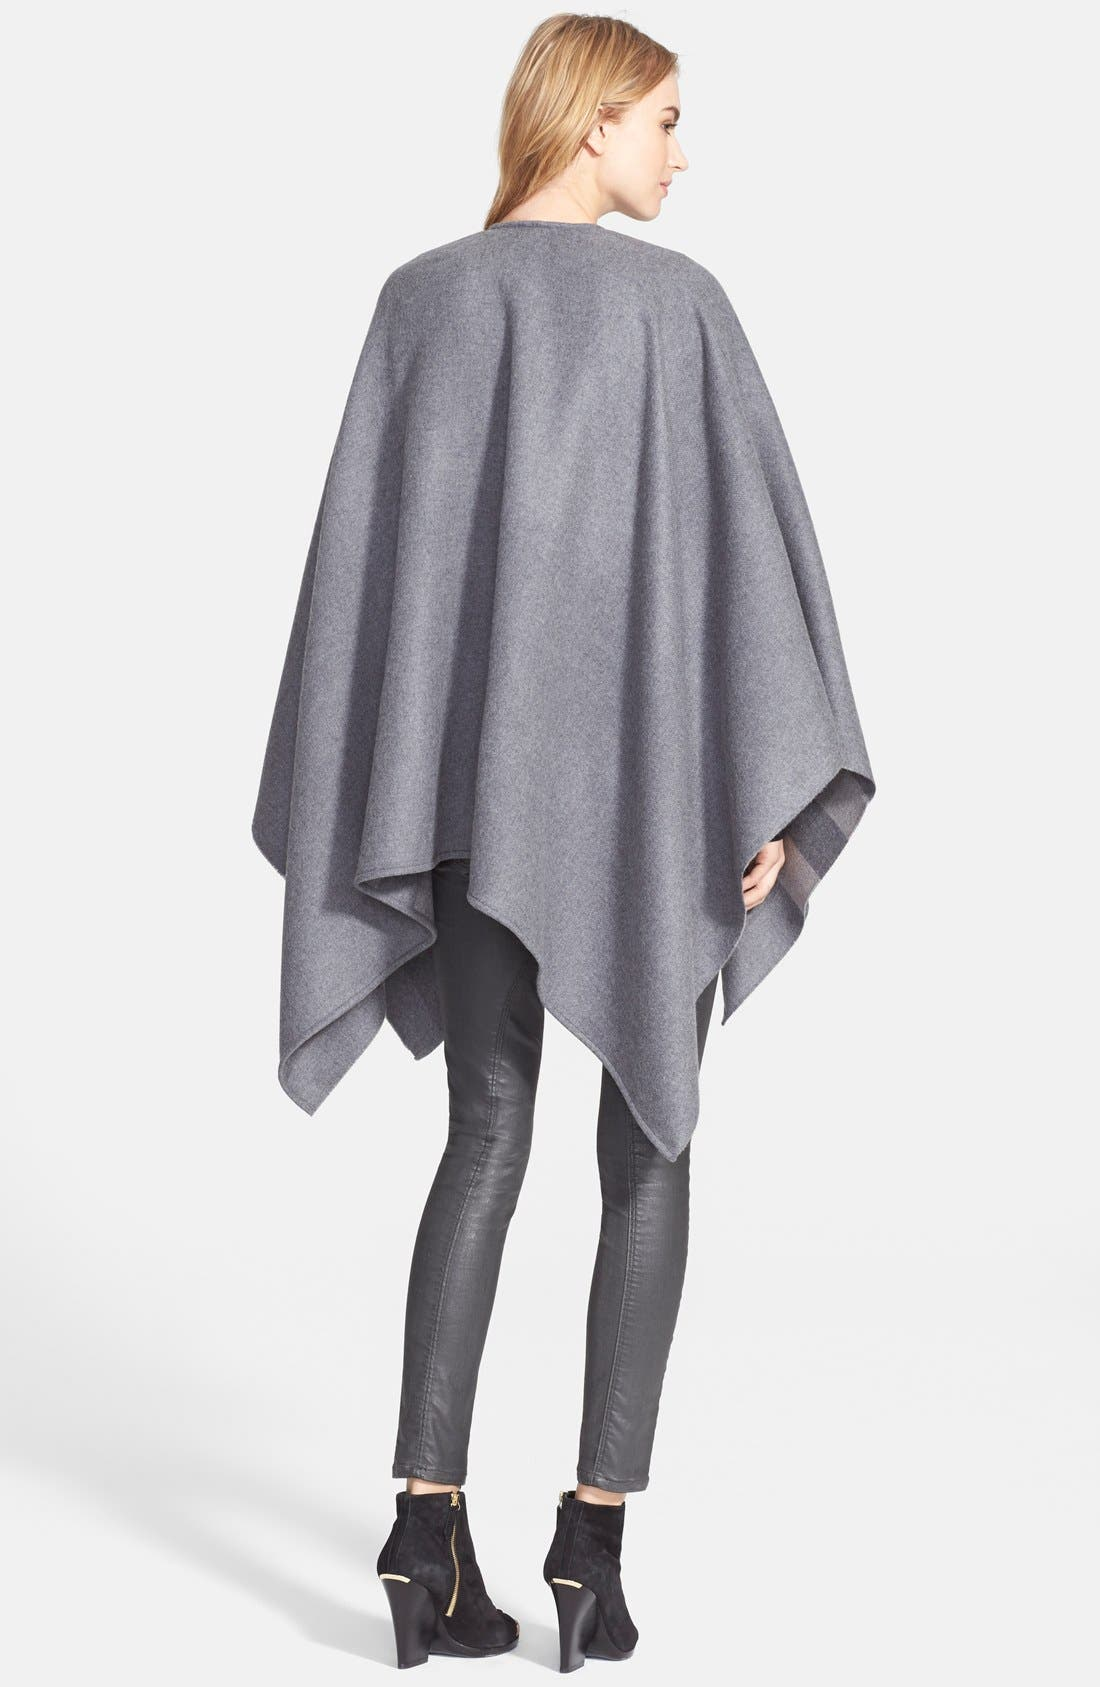 BURBERRY, Reversible Merino Wool Cape, Alternate thumbnail 2, color, 020